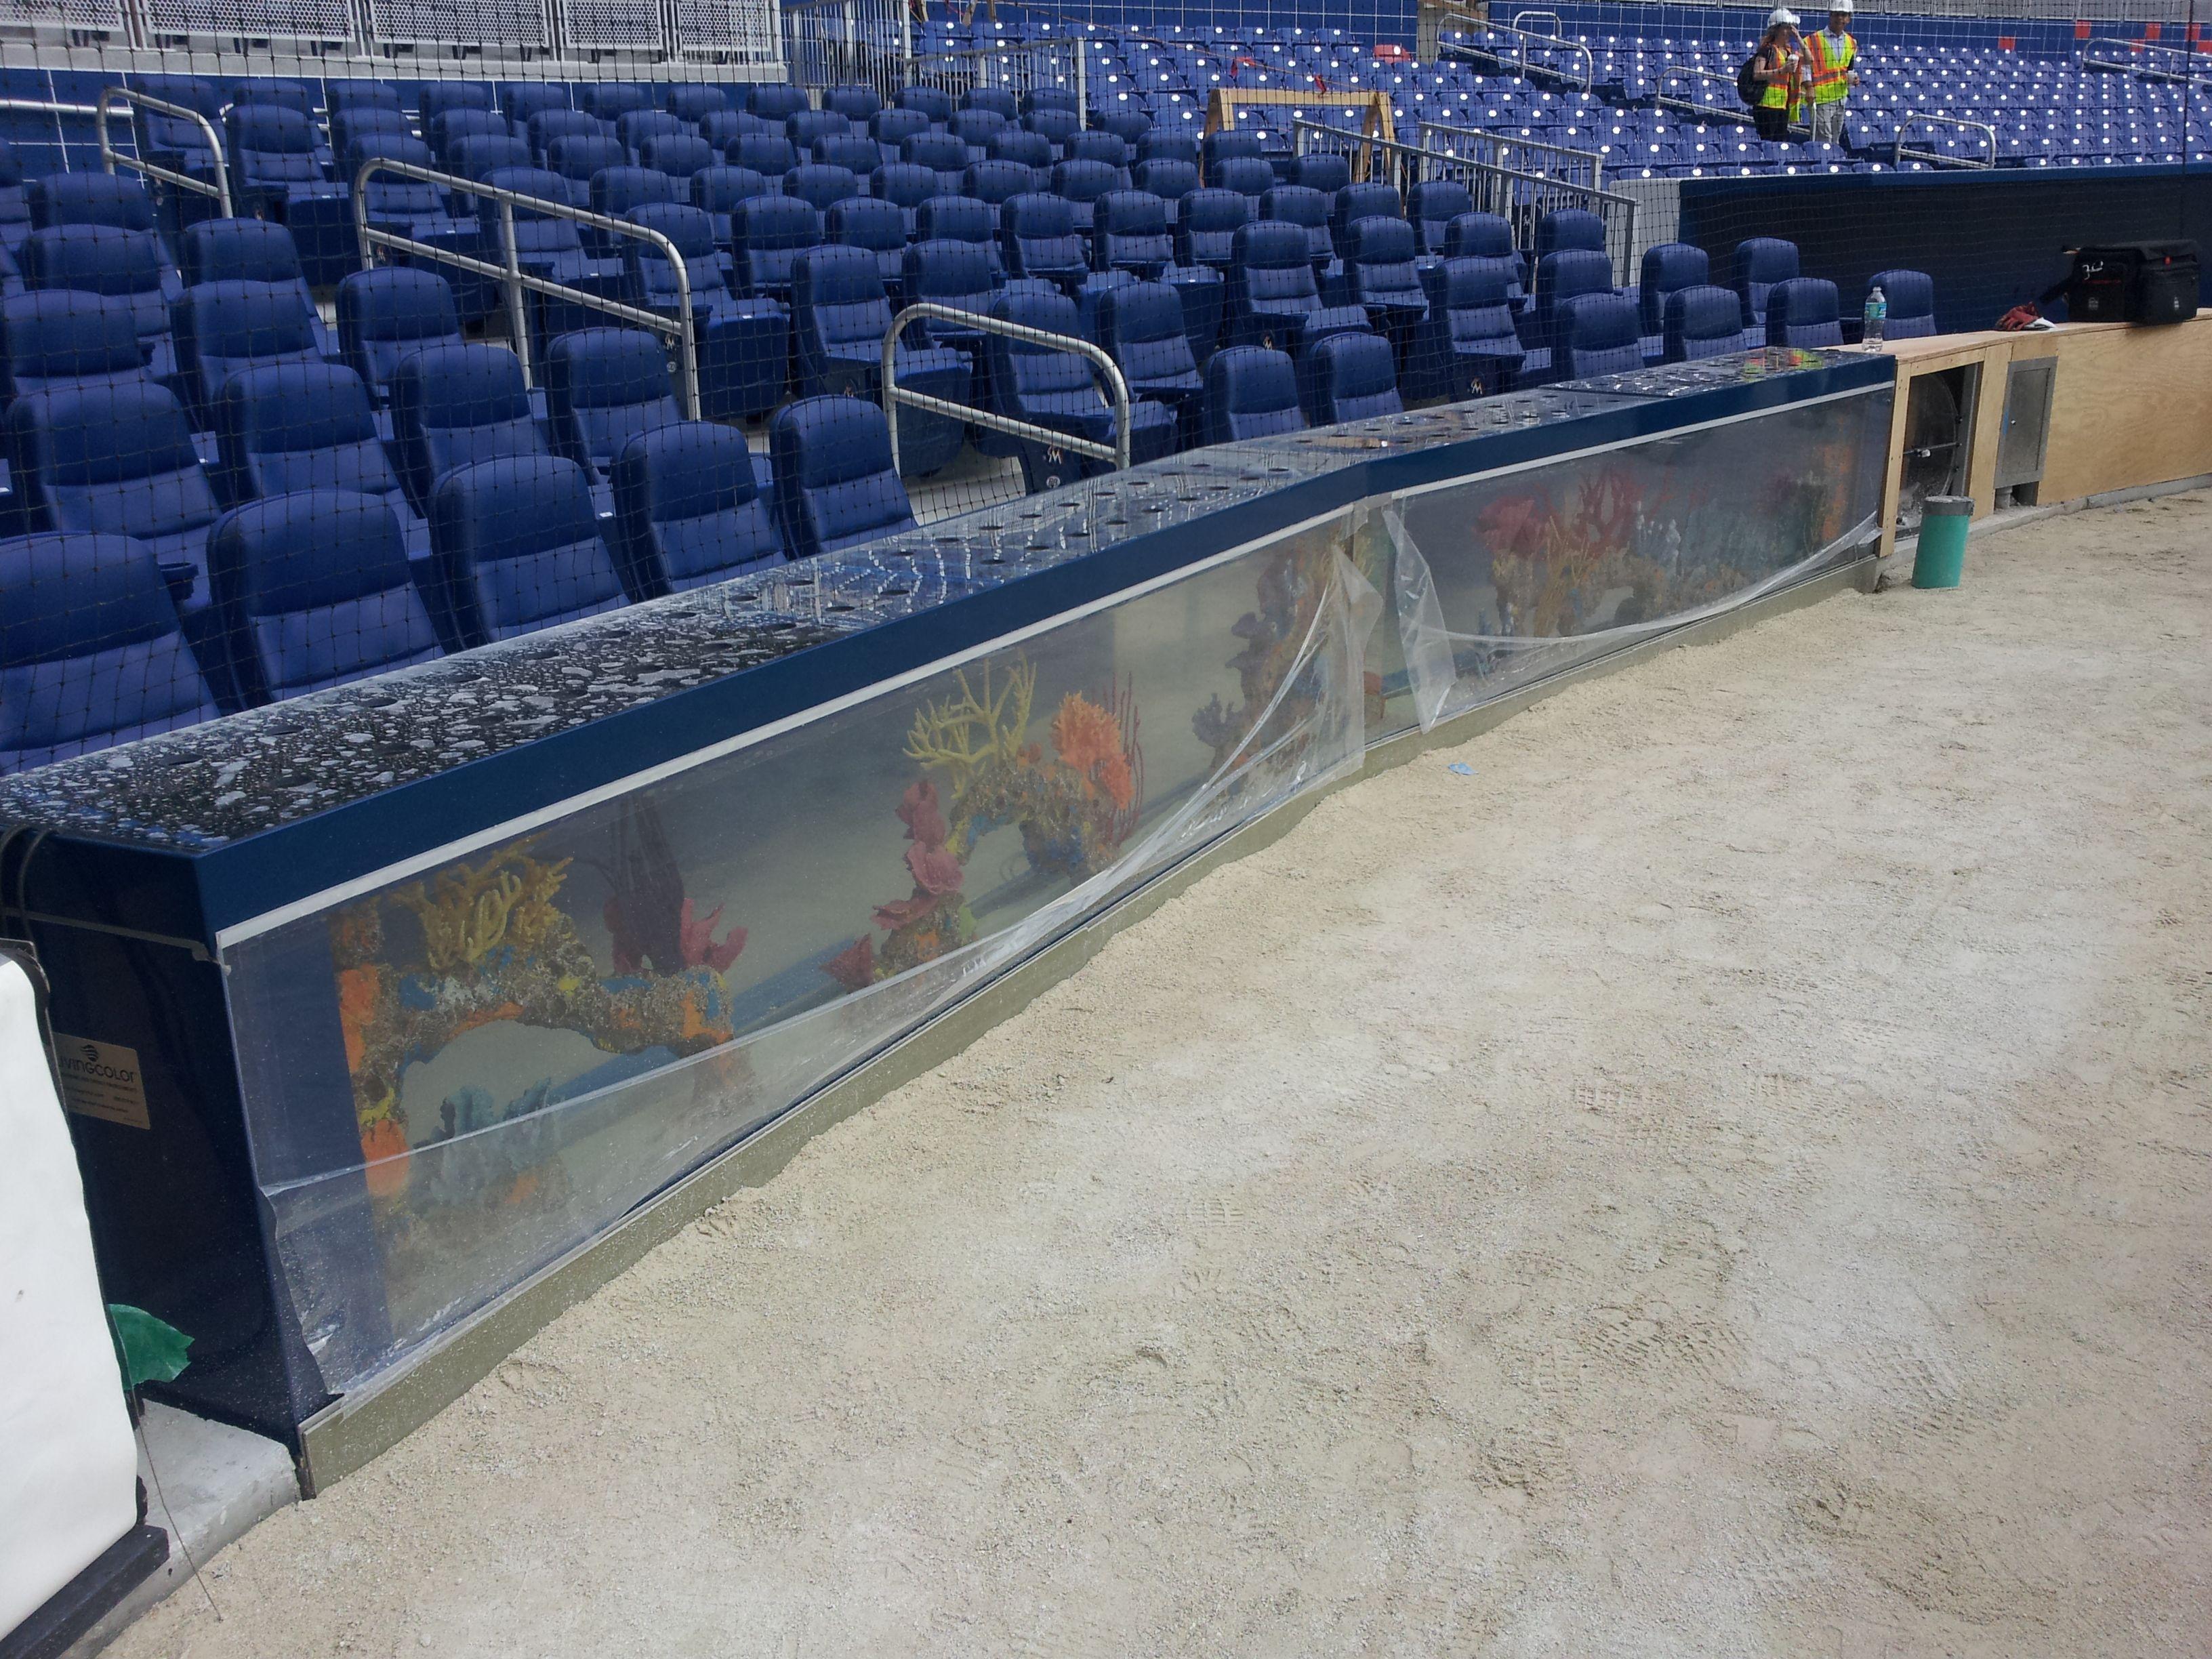 Fish aquarium in jeddah - In Field Aquarium At Marlins New Ballpark